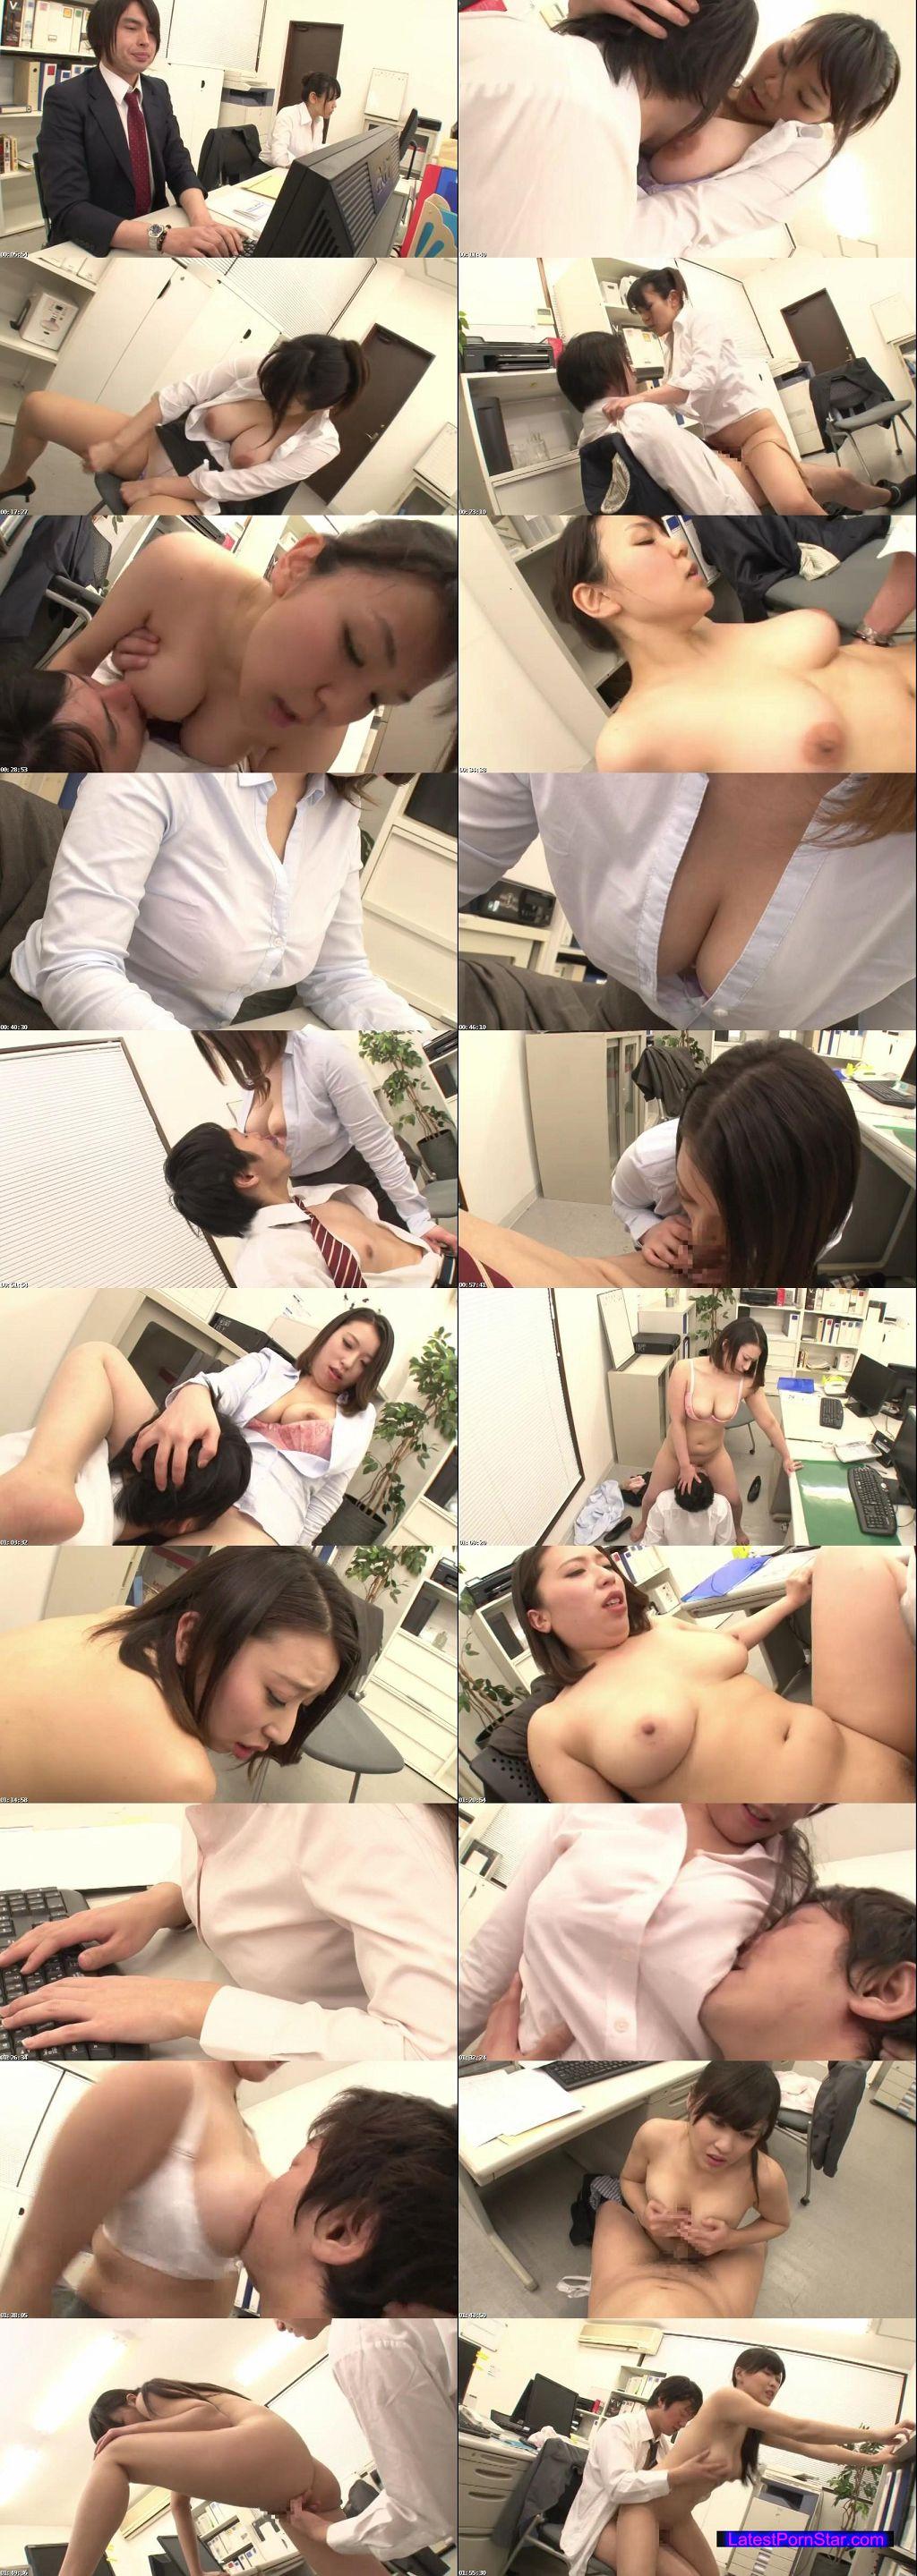 [GS-051] 今年入った新入社員はブラウスがはち切れそうな巨乳女子!目立ち過ぎる胸元にソソられていると、あまりにガン見し過ぎて気付かれた!セクハラだと訴えられる…と思ったら、自らの胸を僕の顔に圧迫させドS丸出しで迫ってきた!!